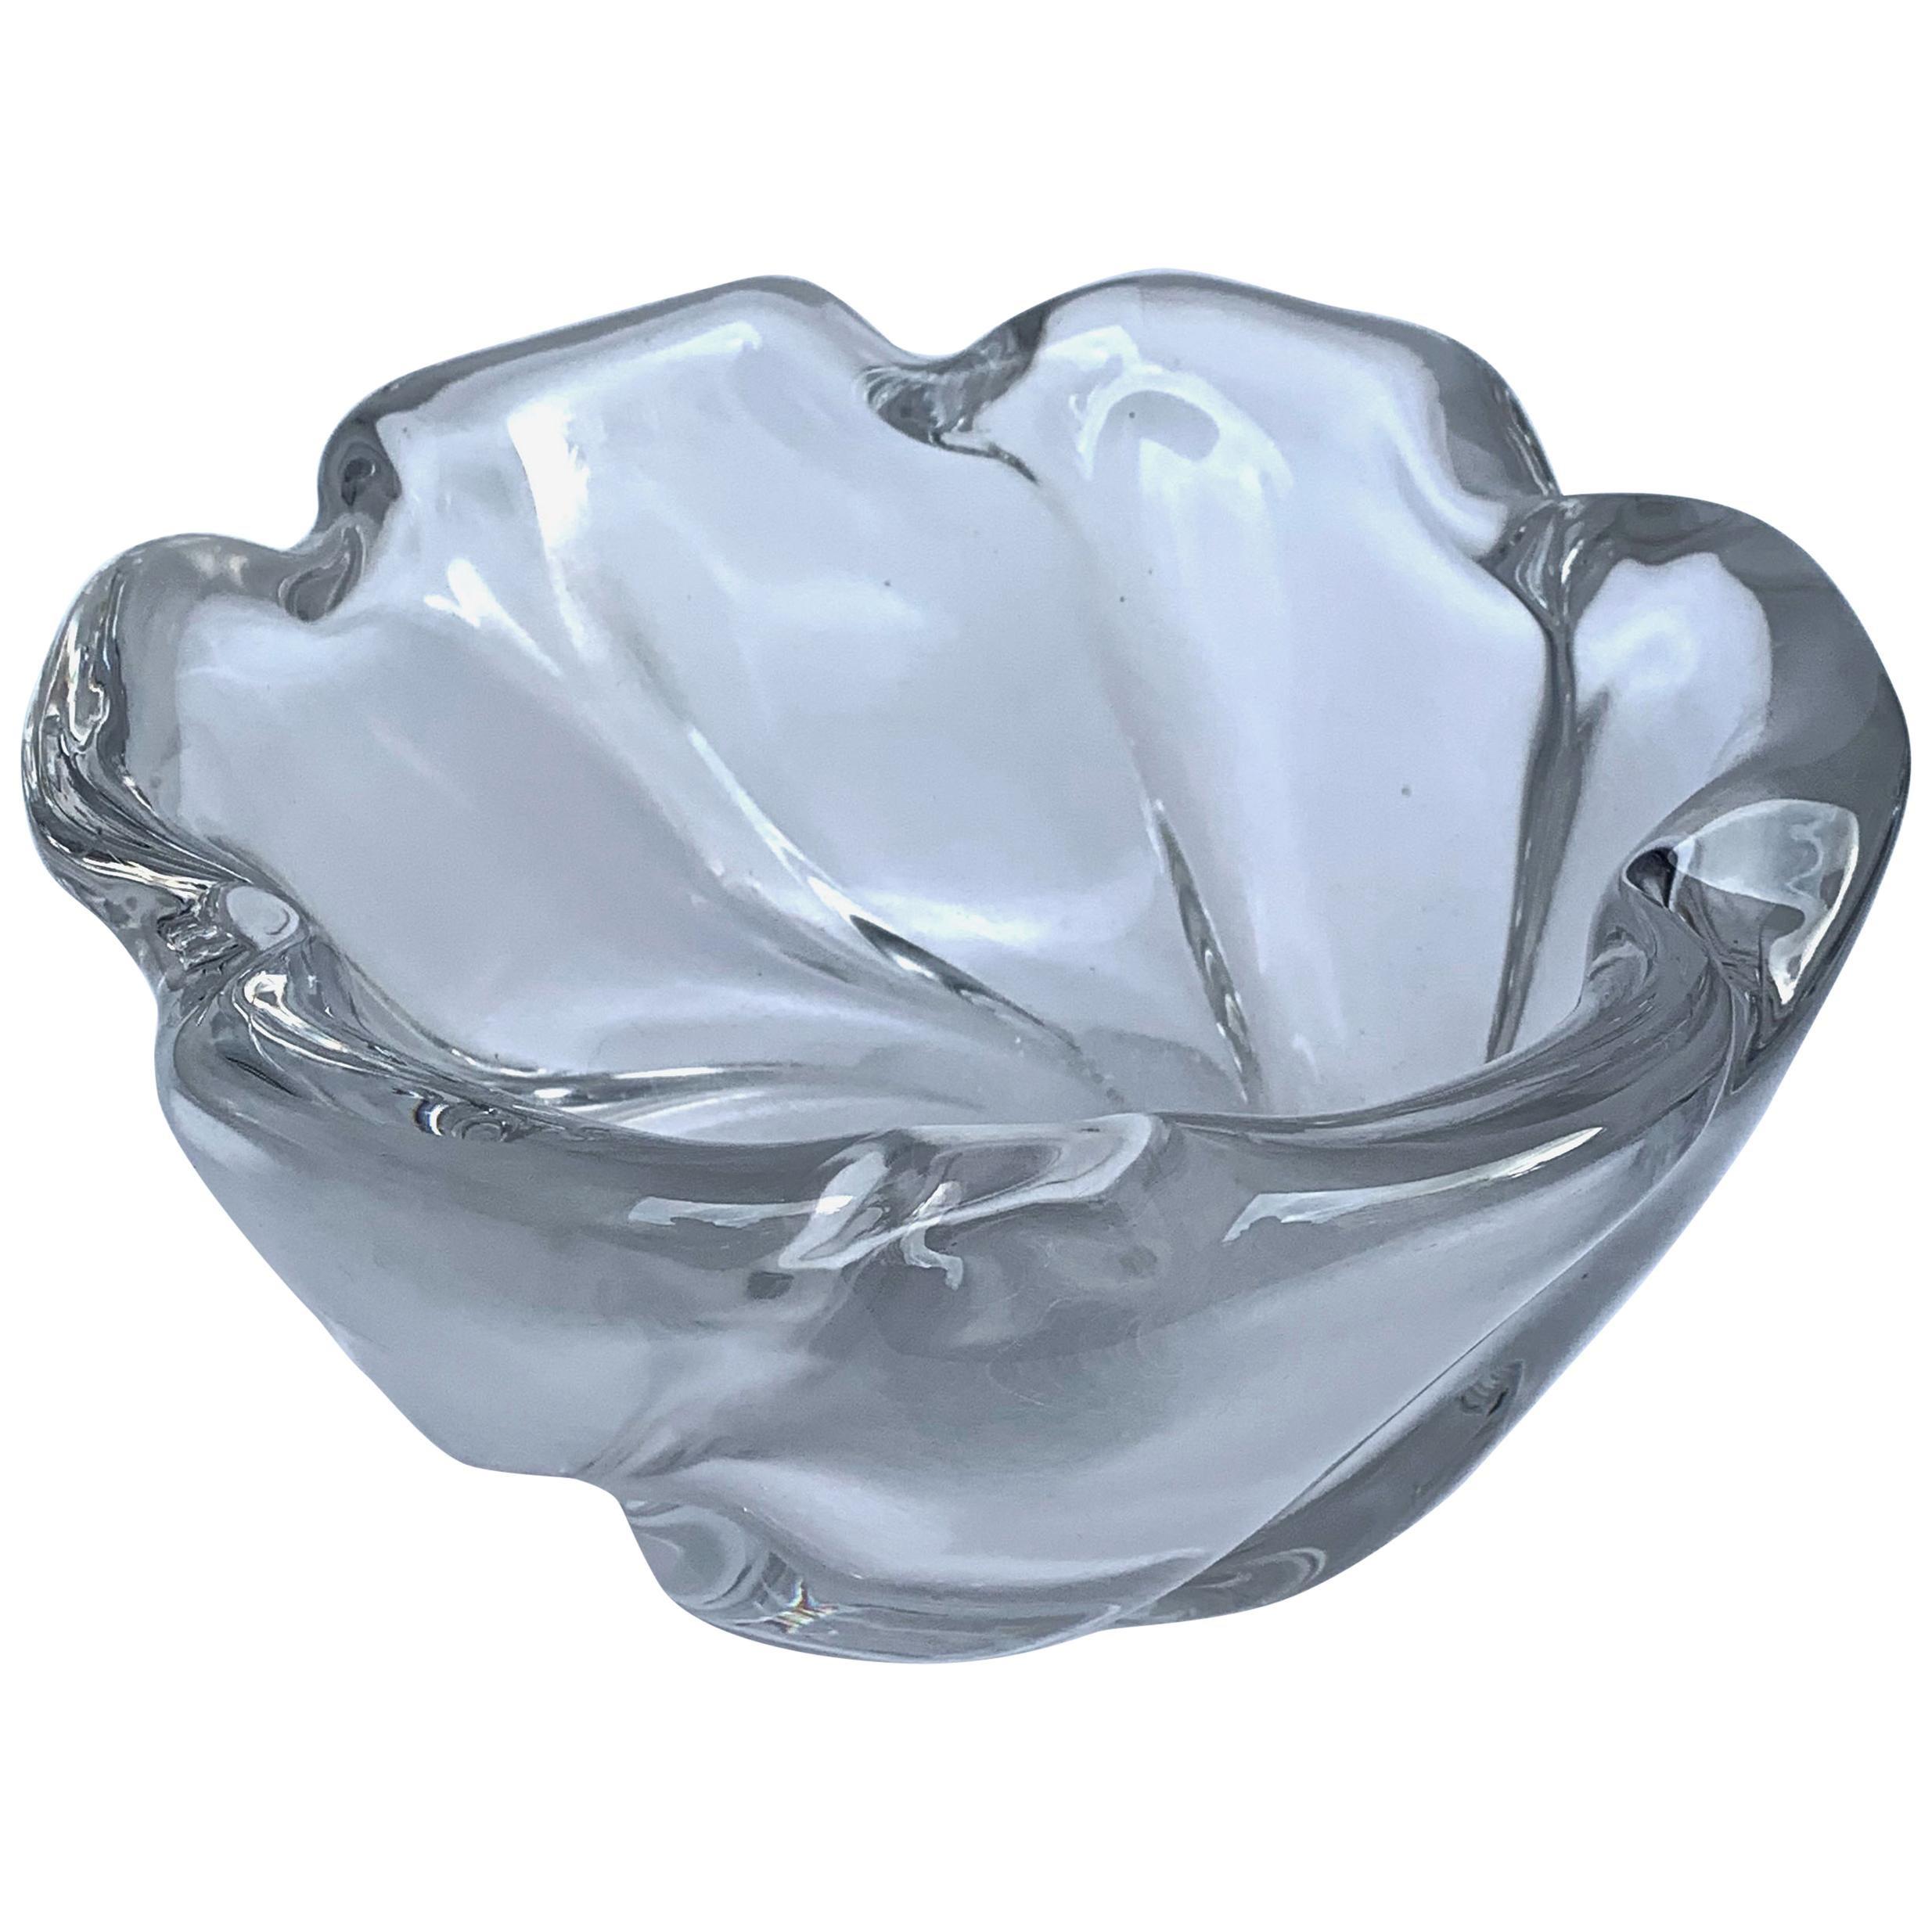 Italian Murano Glass Bowl Centerpiece, Italy, 1950s